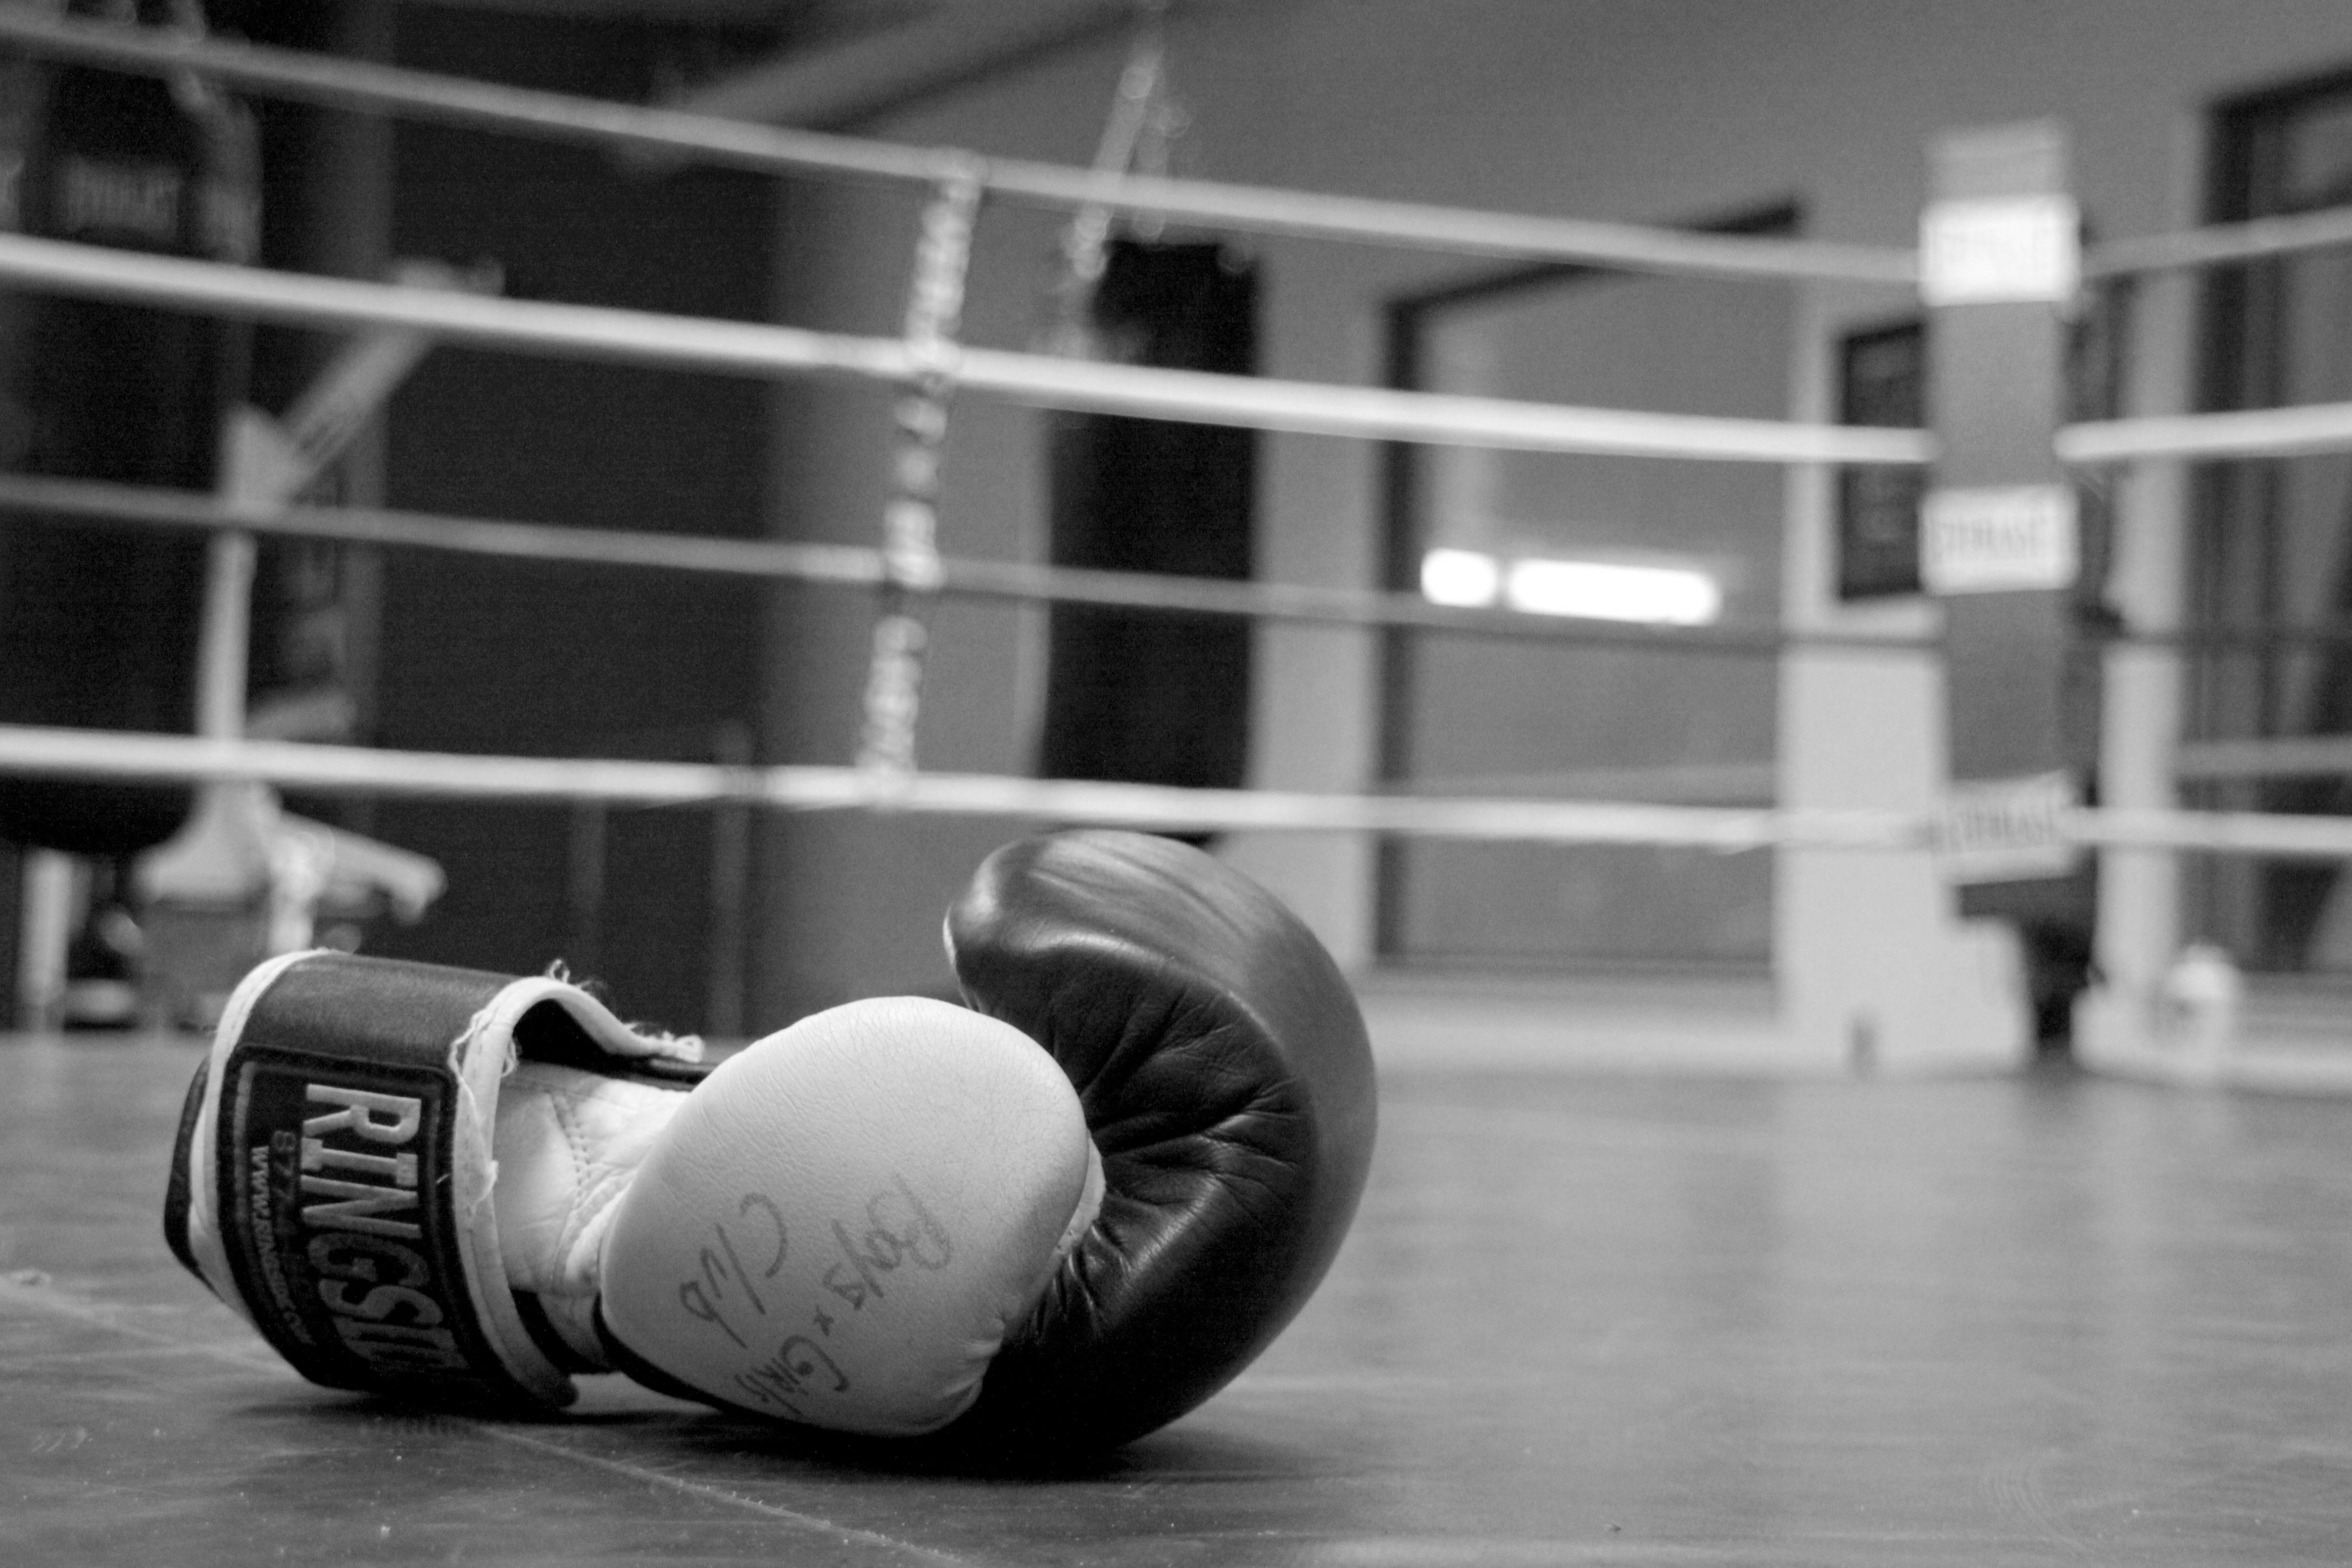 Картинки красивые про бокс, охраны труда